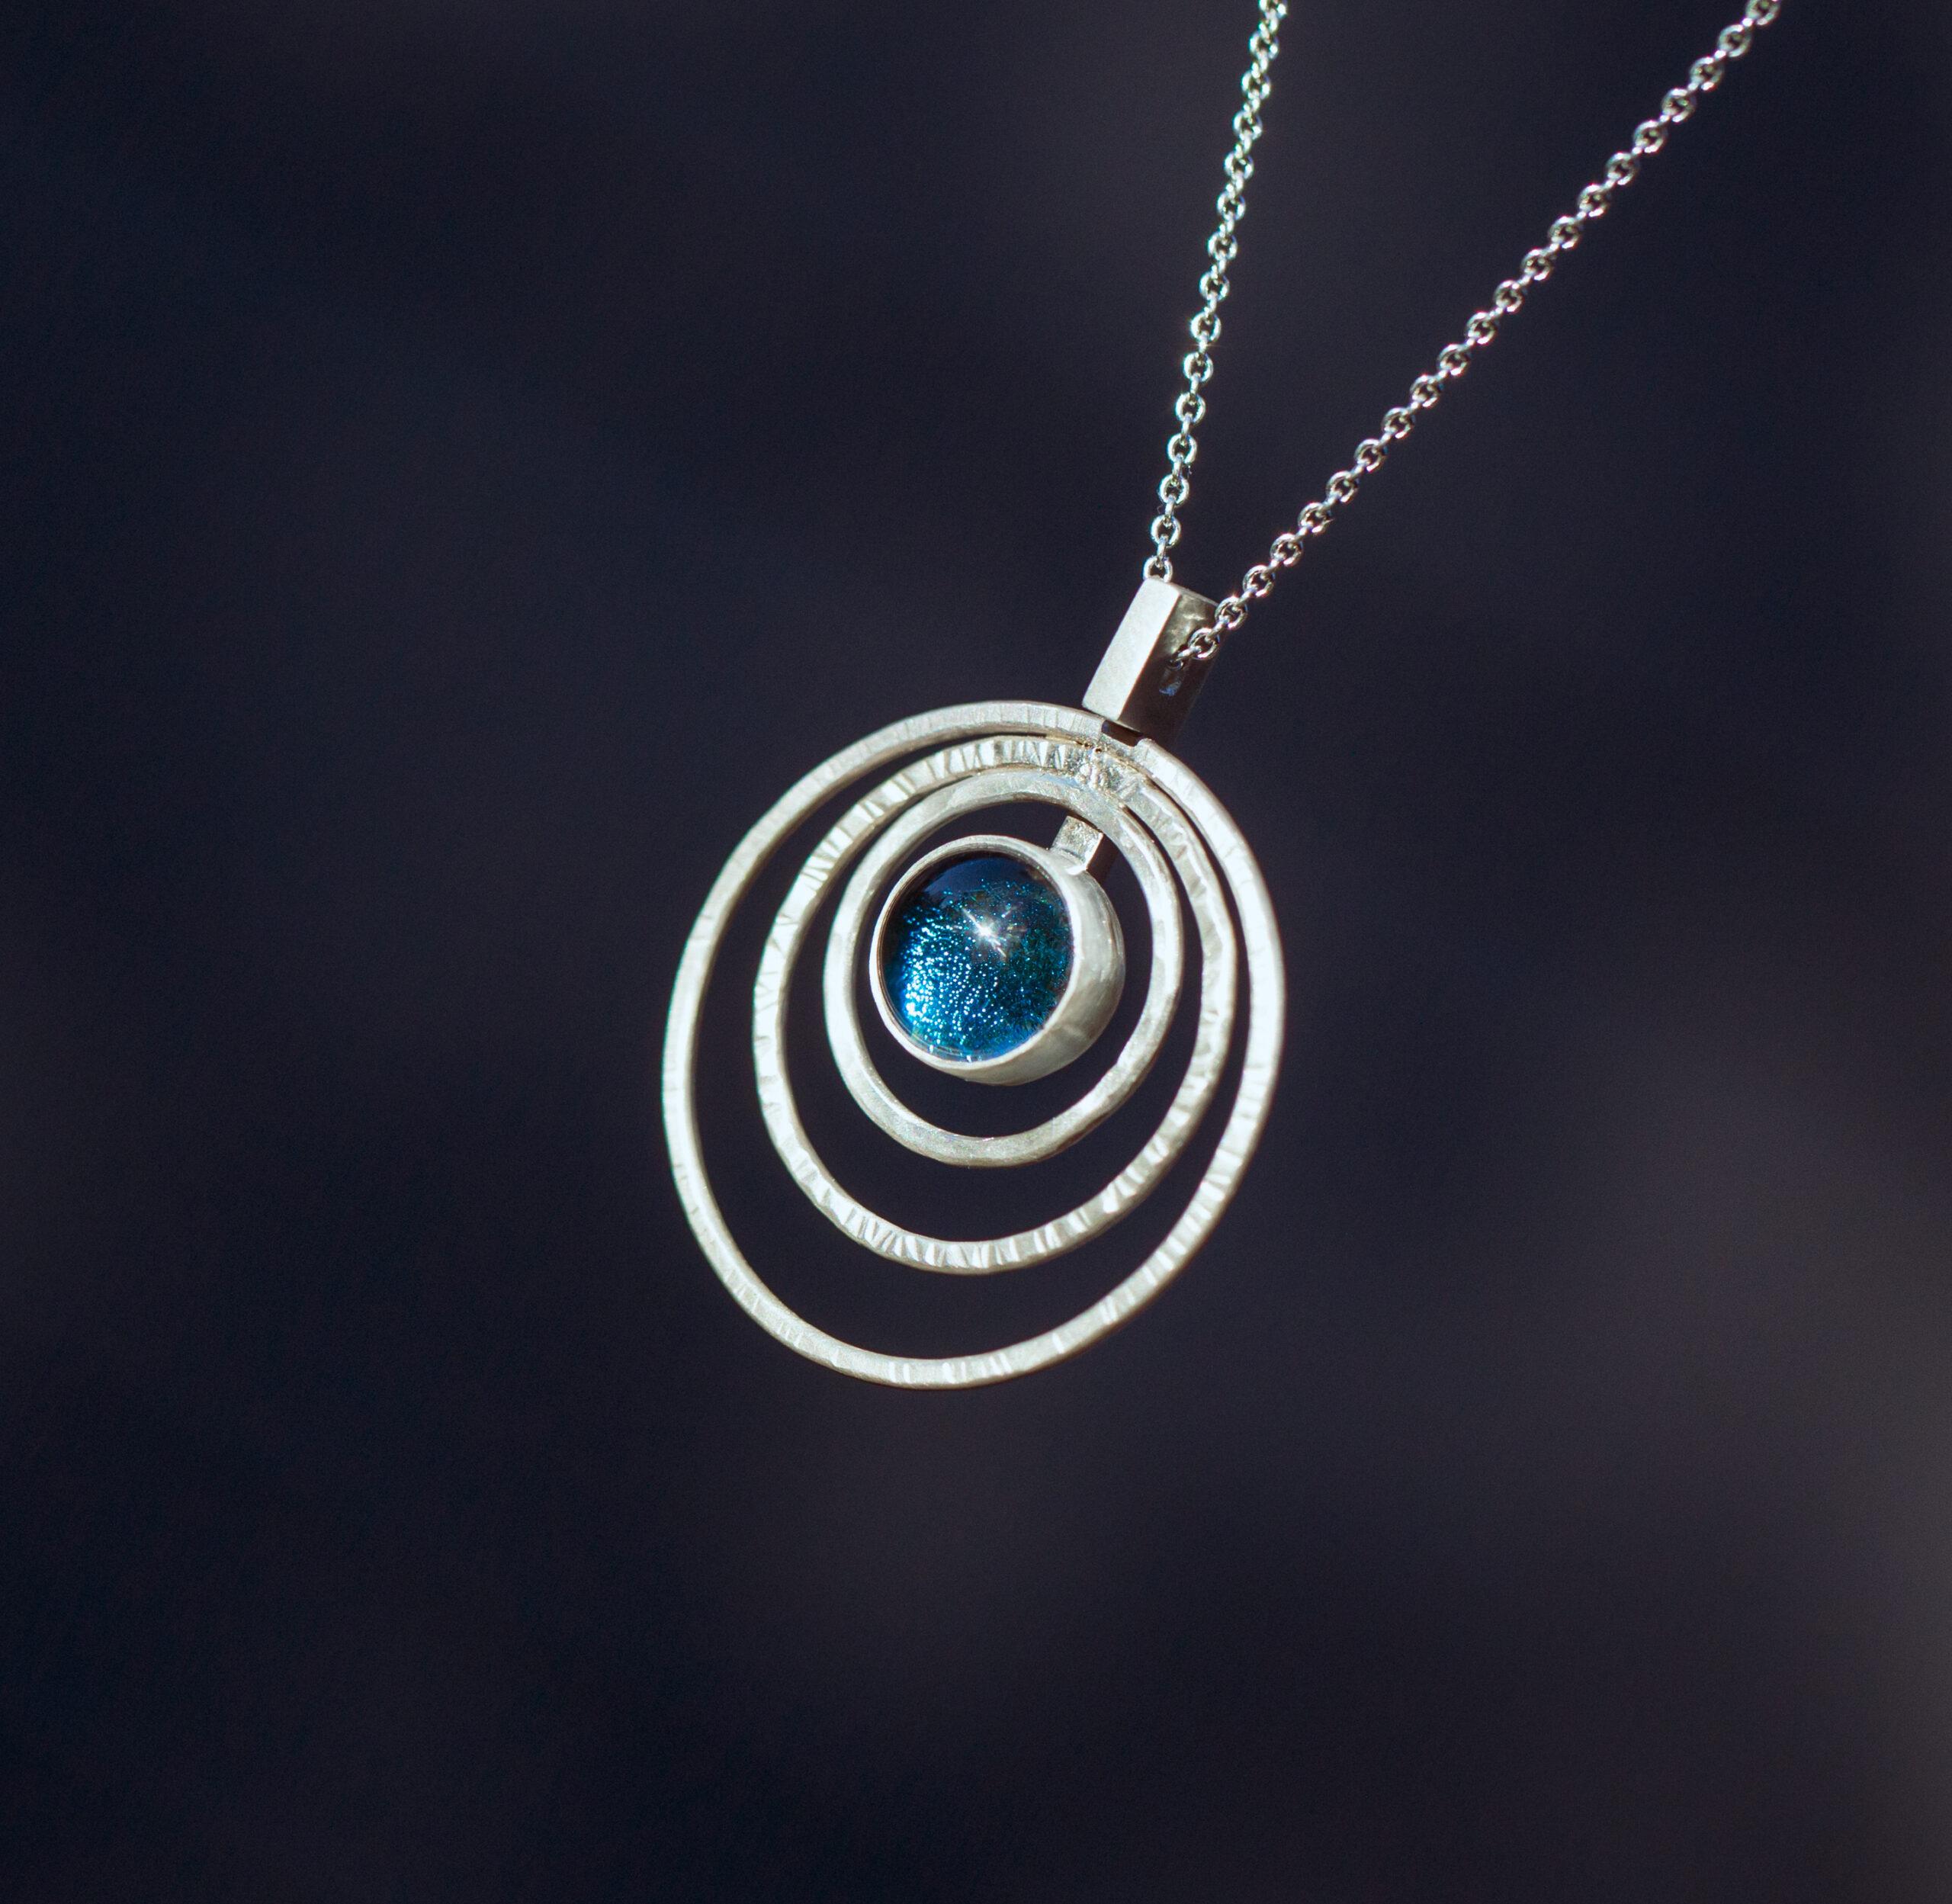 Lucie Harris Glass, Unique Silver jewellery necklace